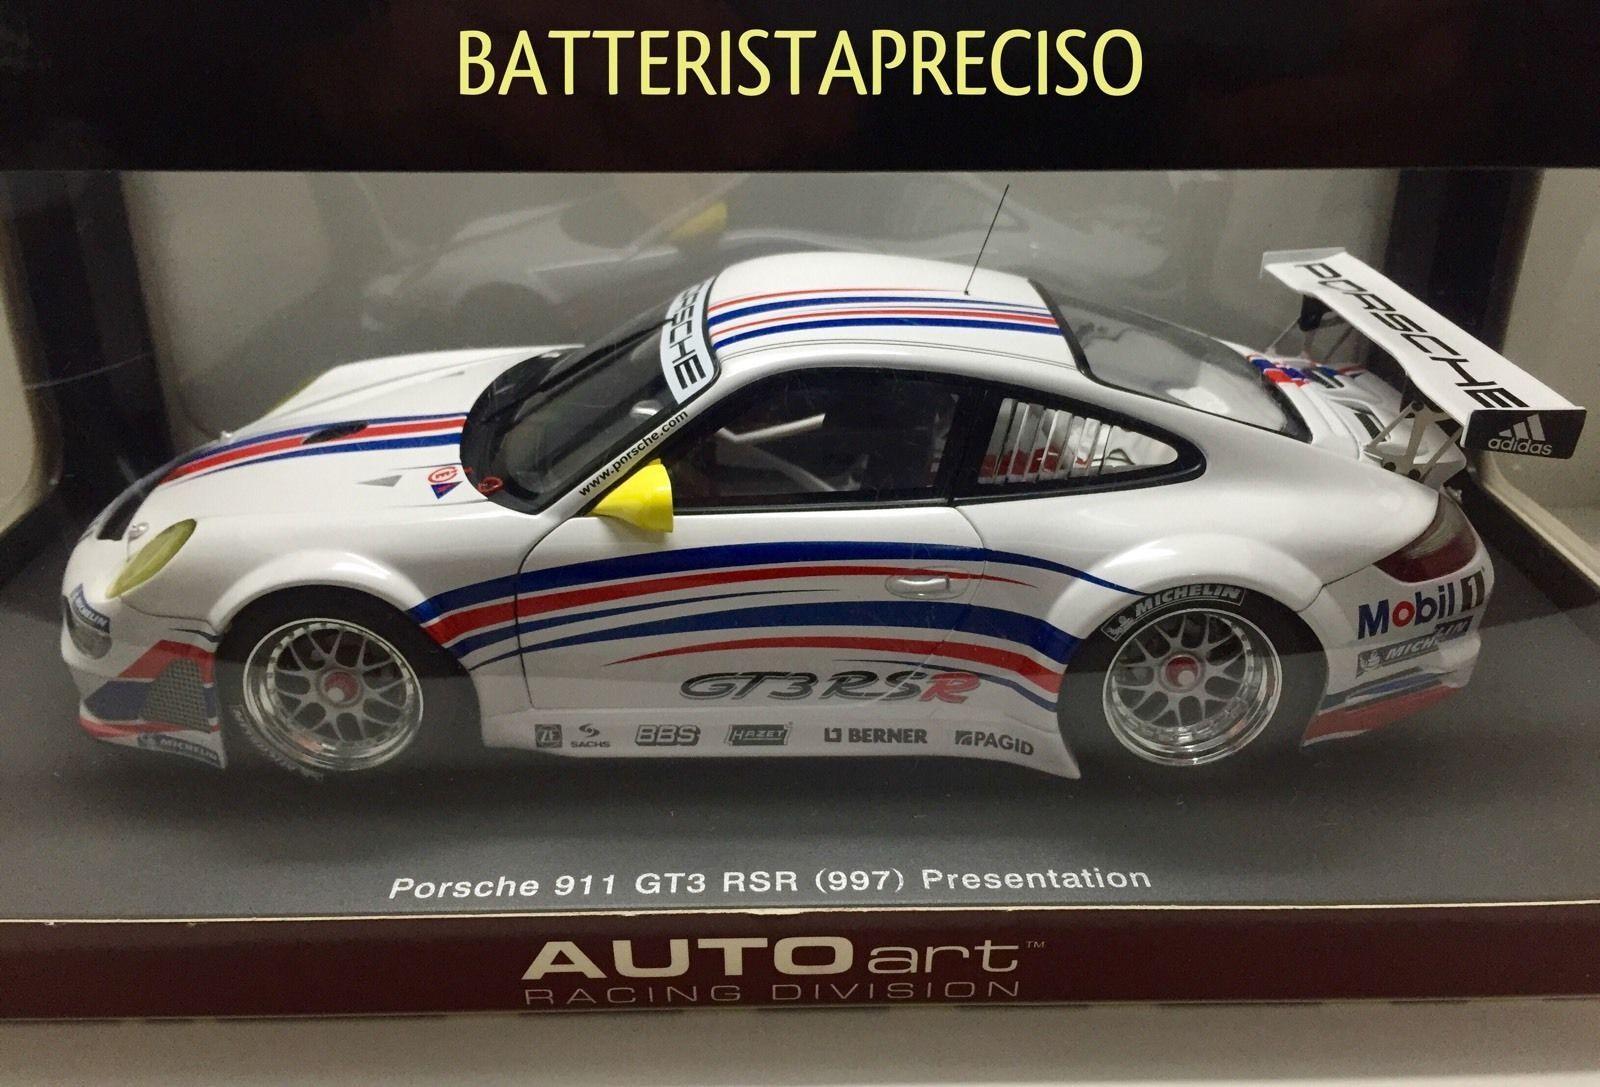 1 18 Autoart Porsche 911 gt3 rsr (997) 80770 presentation-rareza